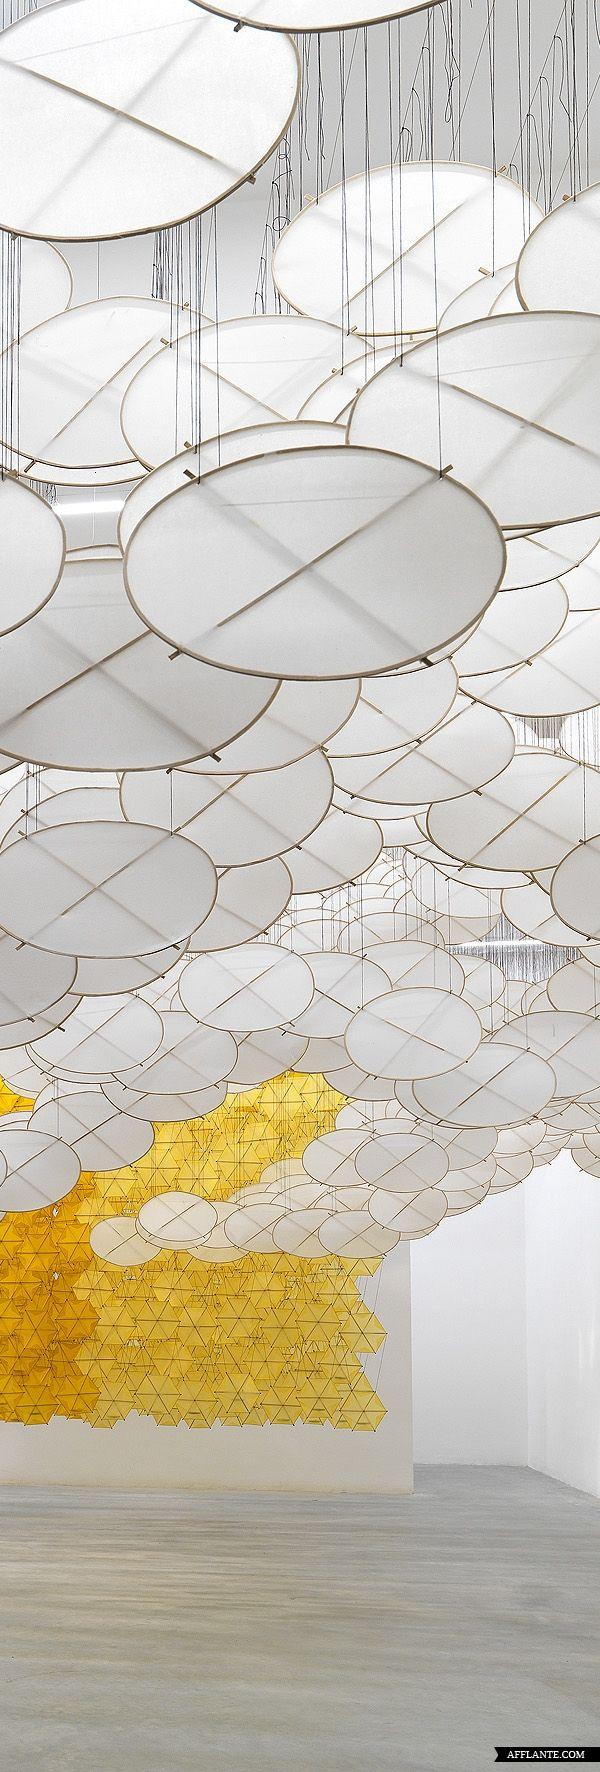 best design images on pinterest installation art art